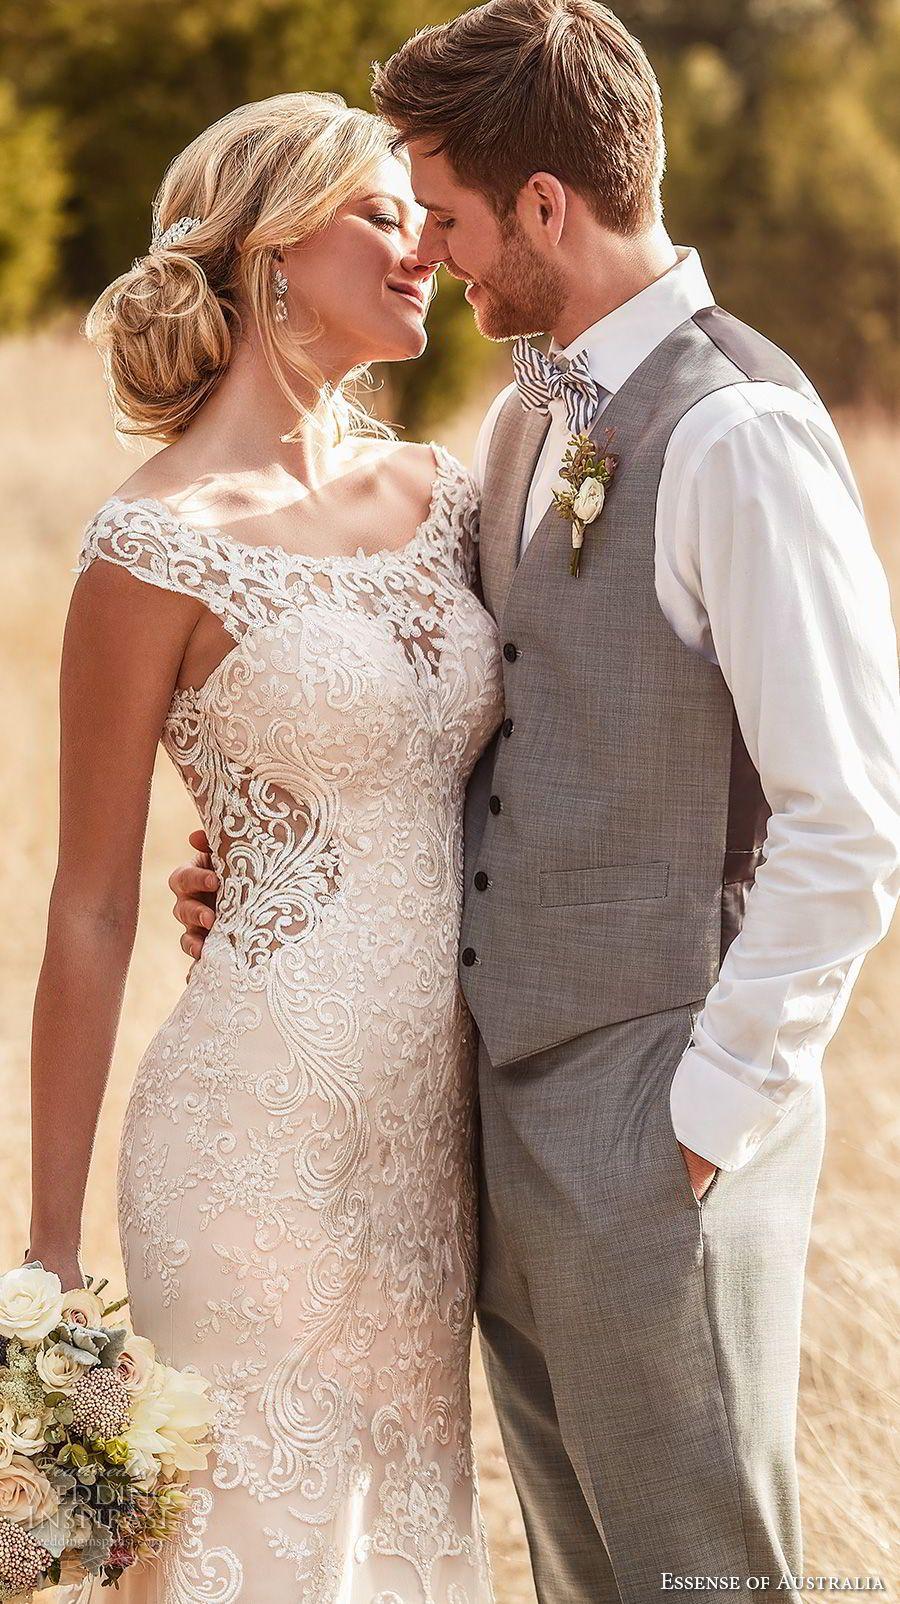 9c22e7a1f4 essense australia fall 2017 bridal cap sleeves illusion bateau sweetheart  neckline full embellishment elegant blush color sheath wedding dress  covered lace ...